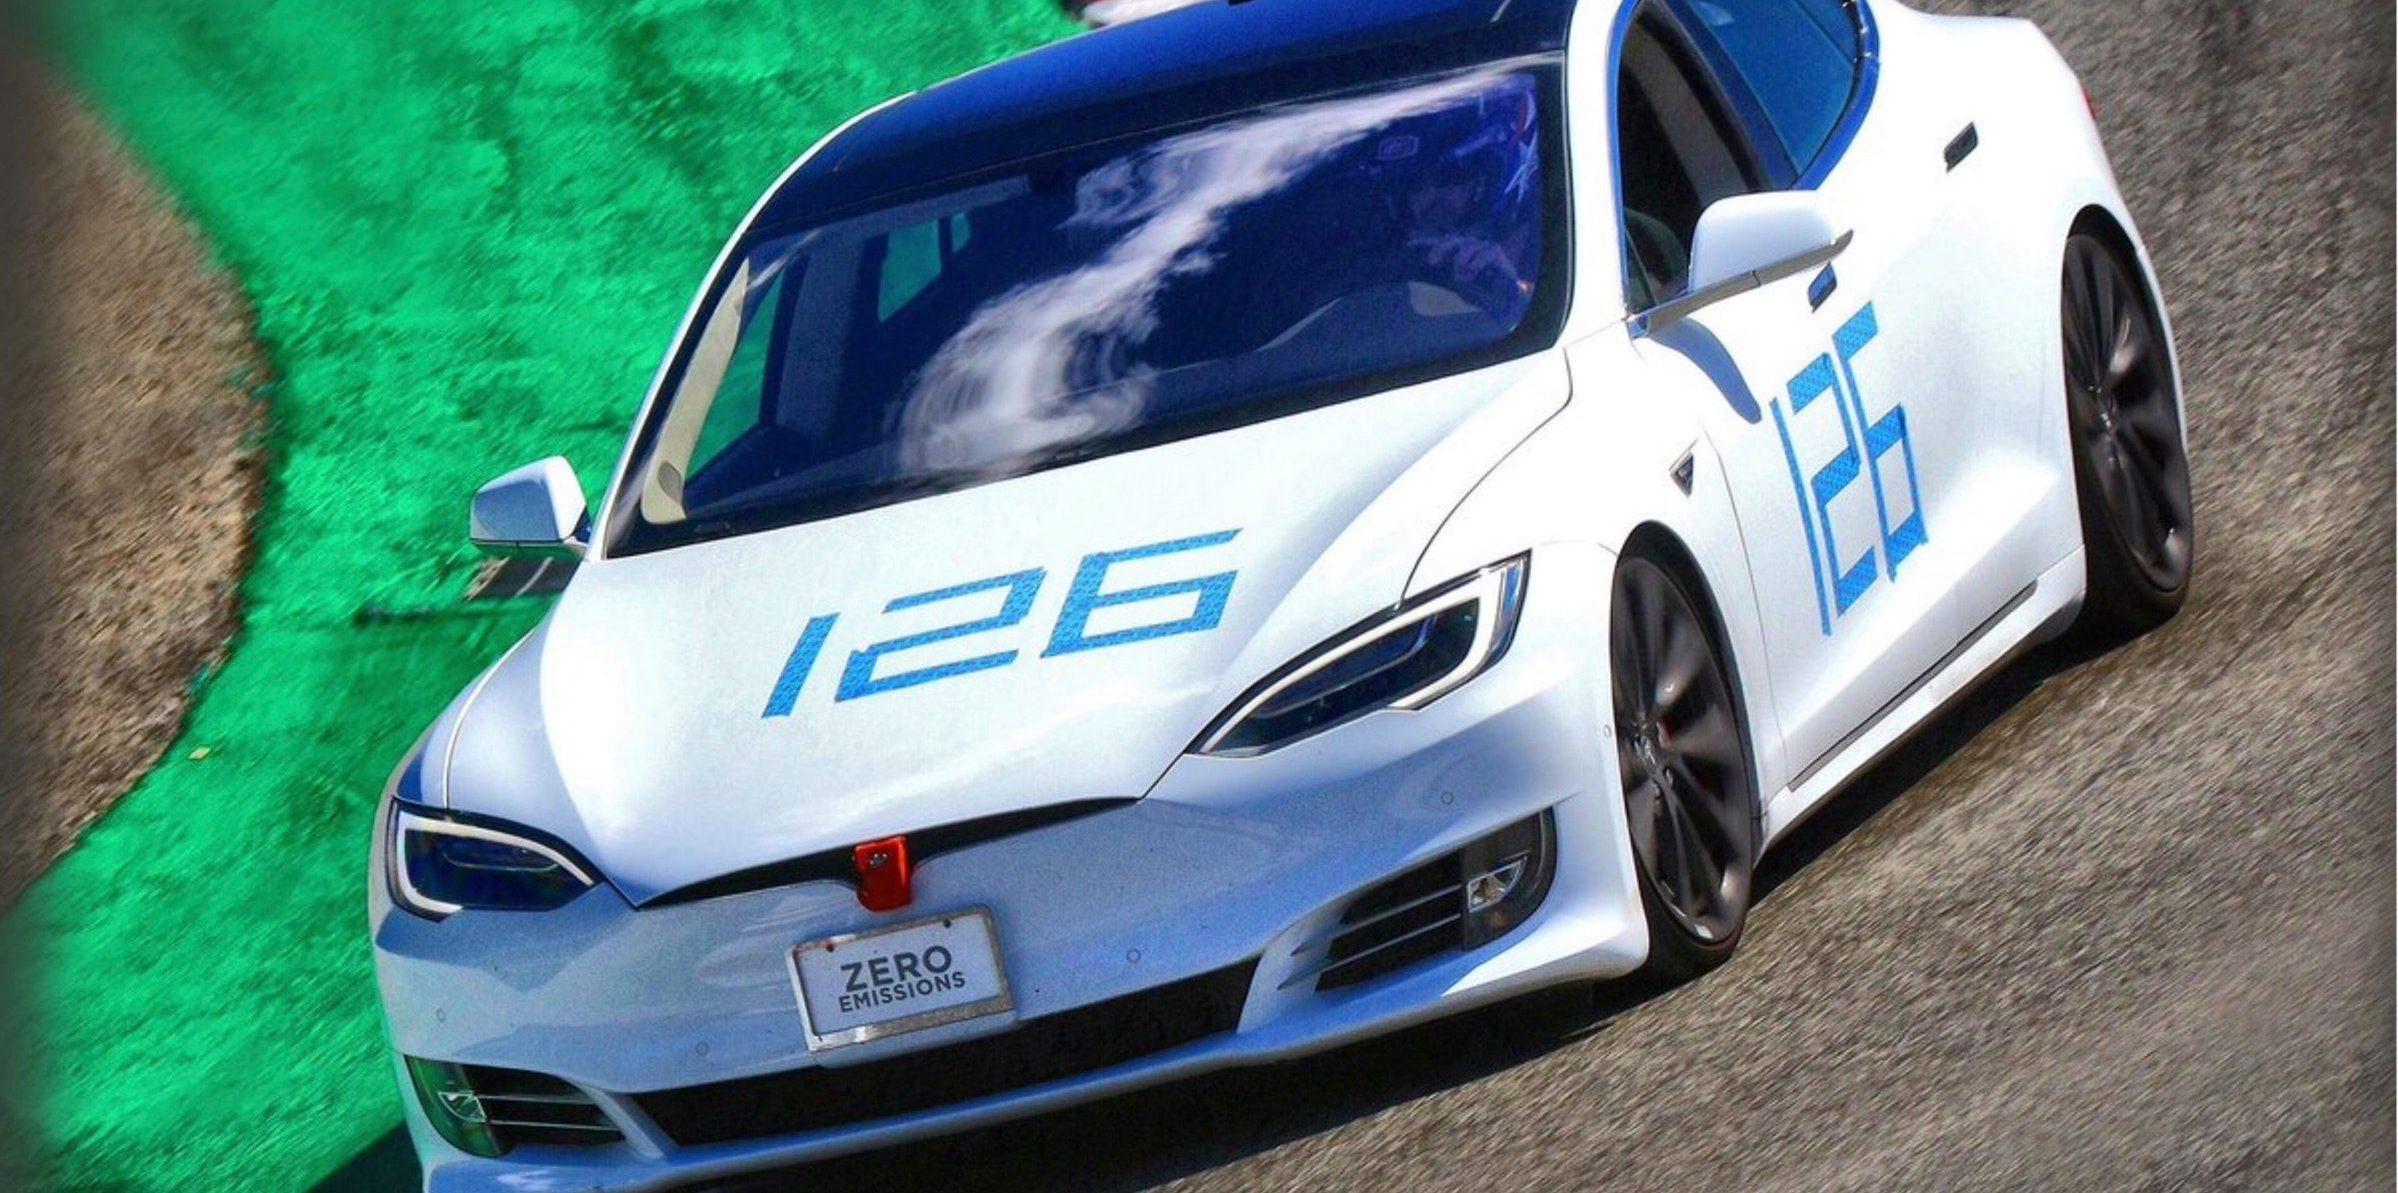 Tesla Model S breaks Laguna Seca lap records, says Elon Musk